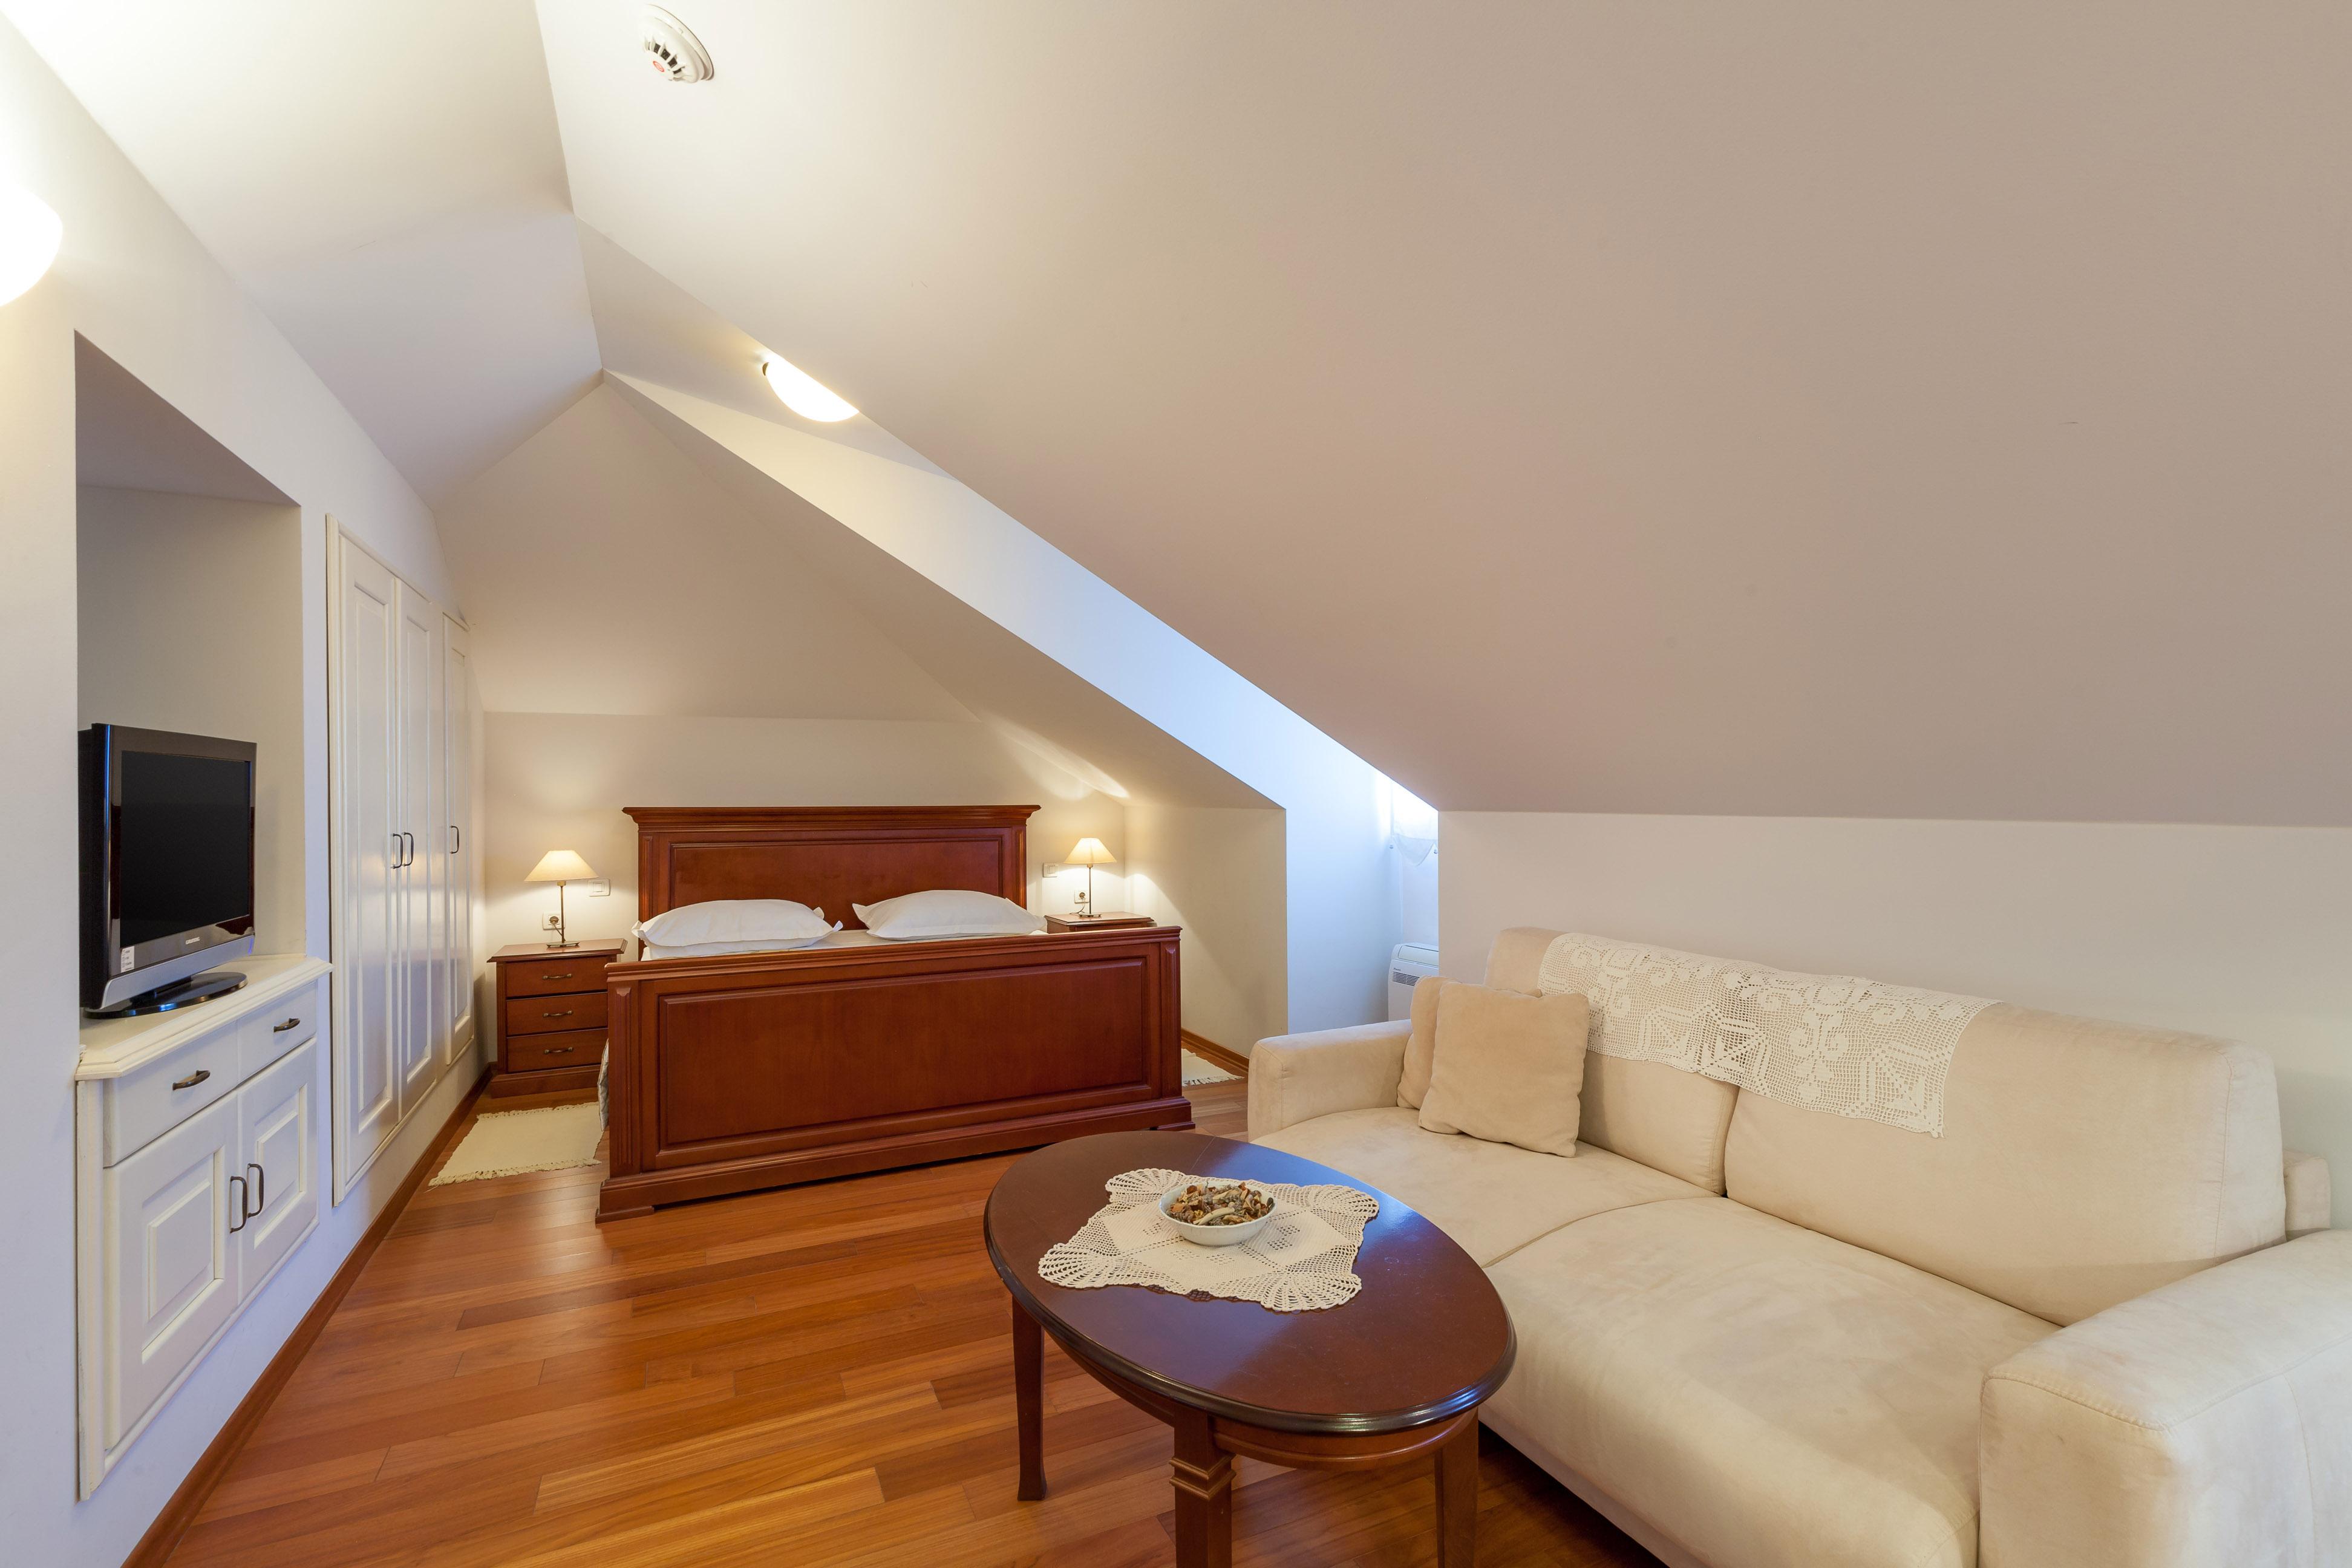 Suite room in the attic of the Villa Mir Vami